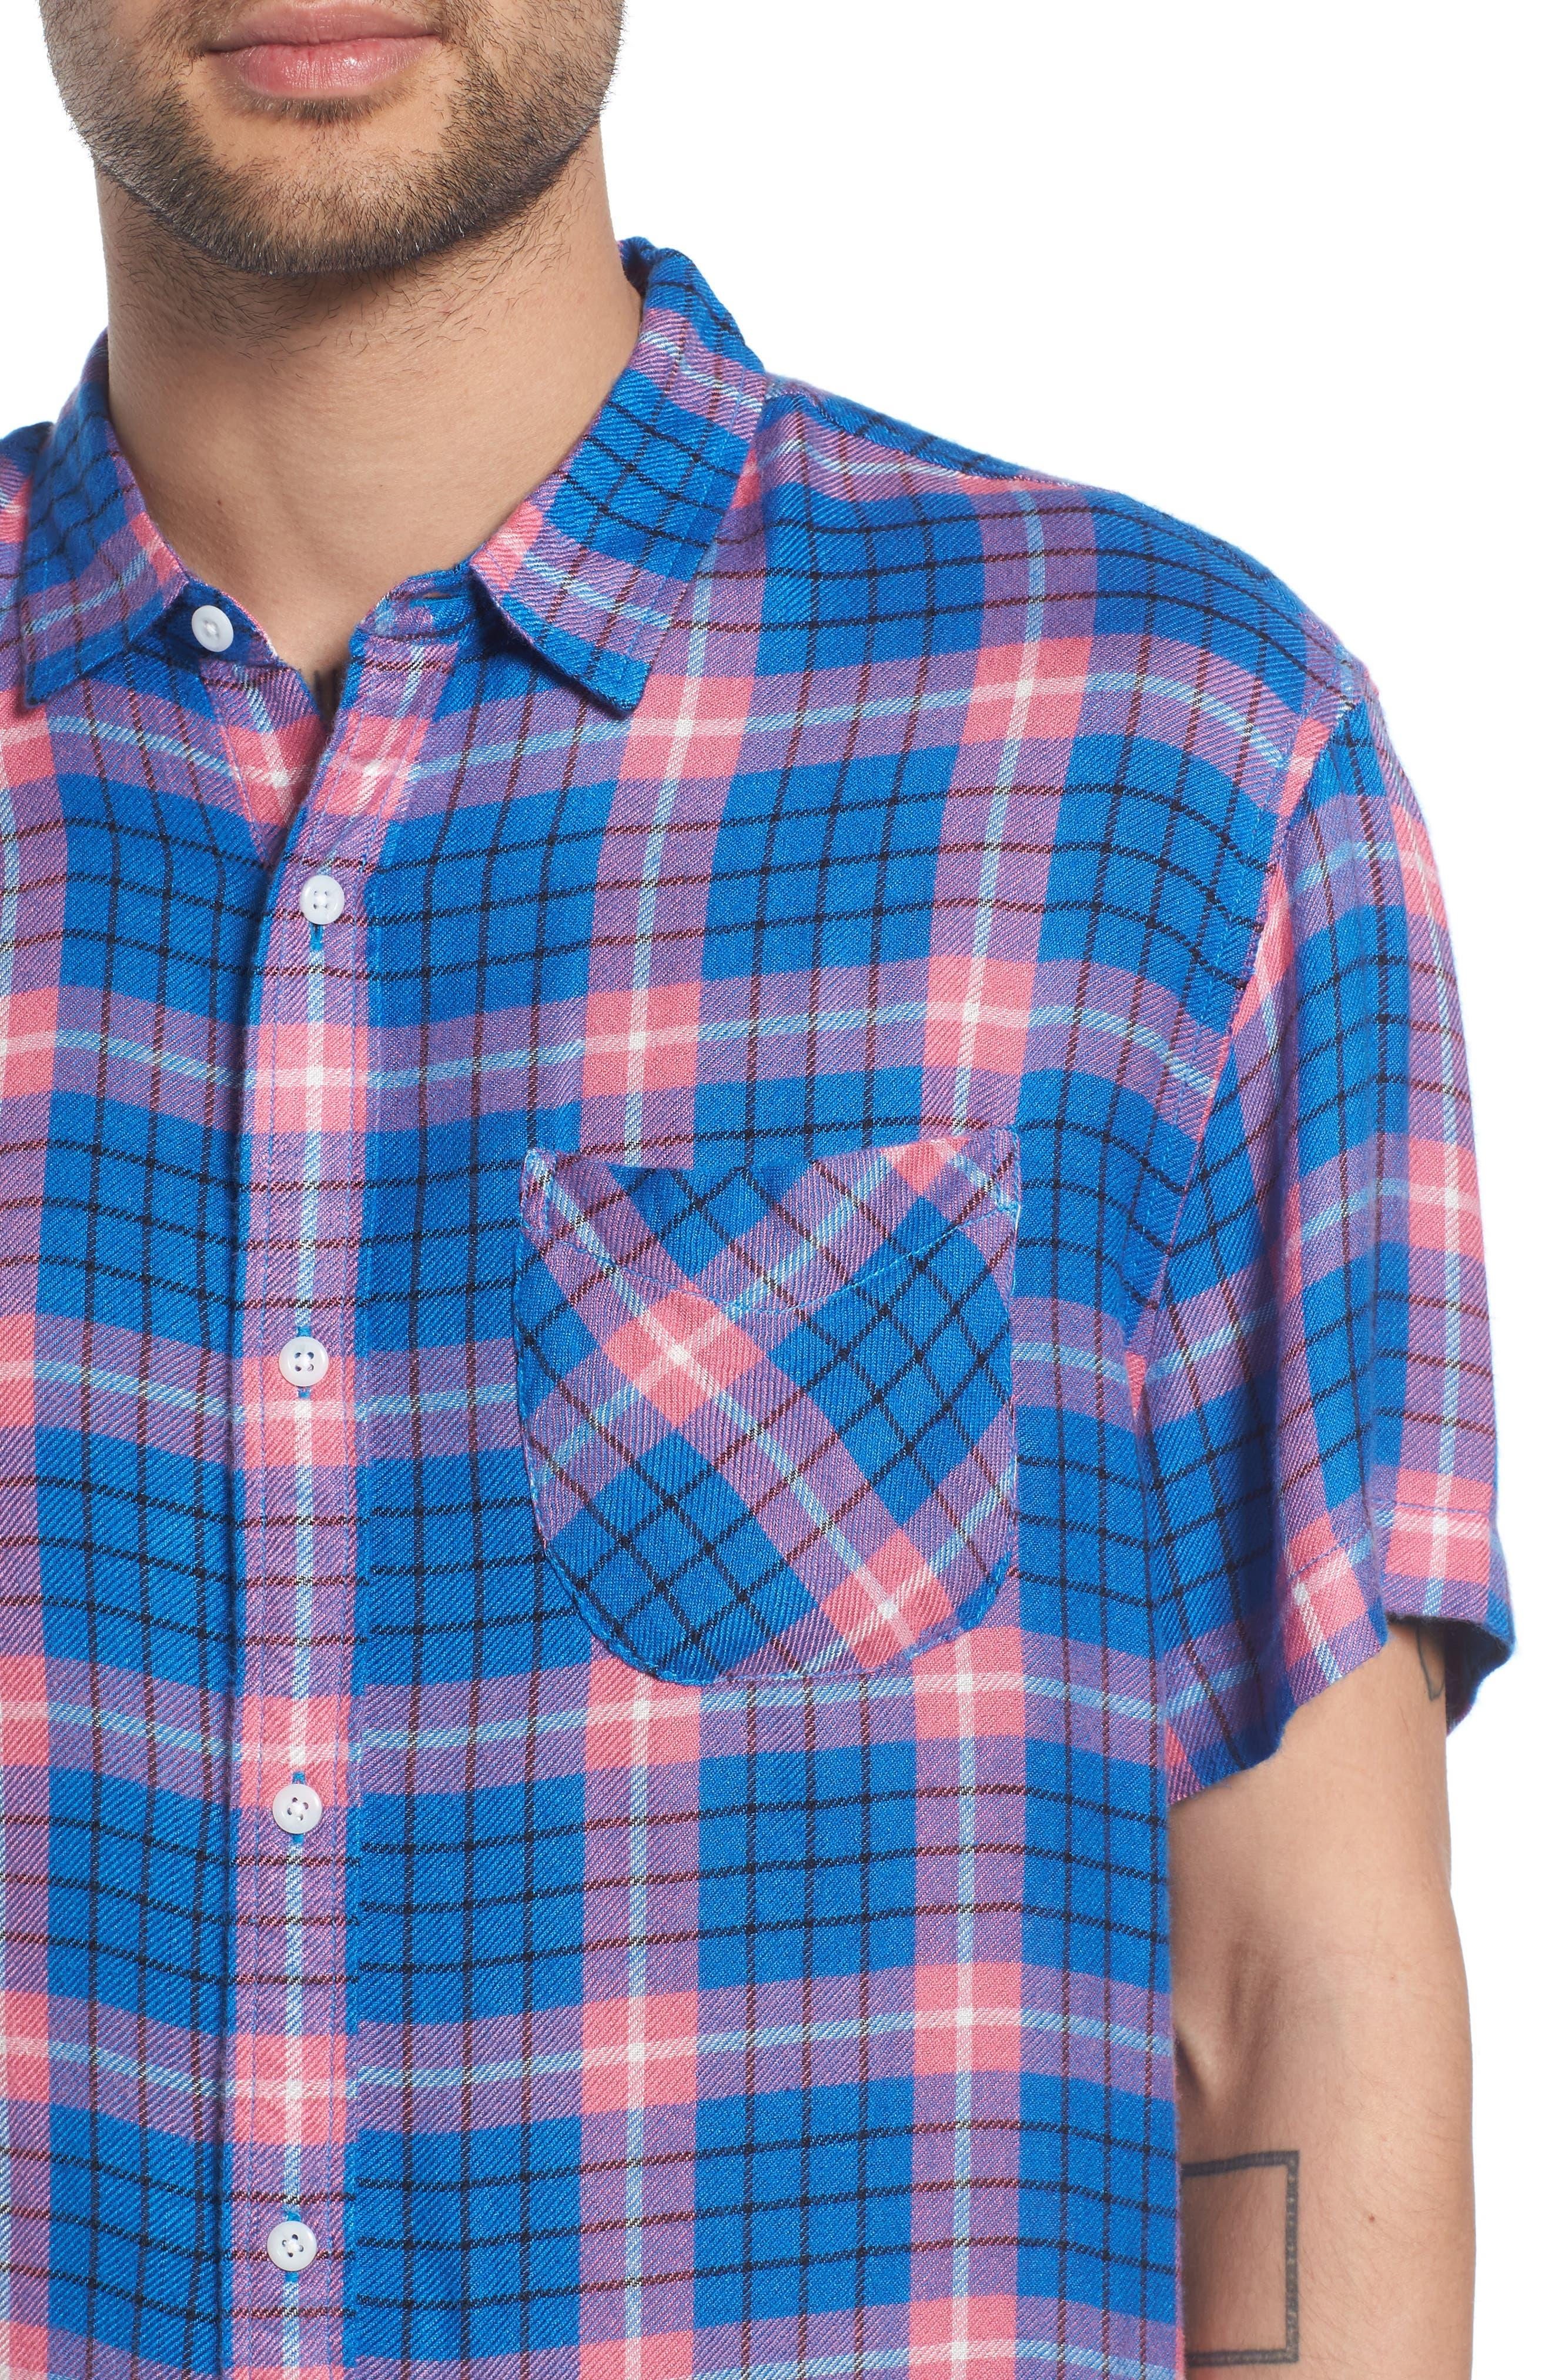 Flannel Woven Shirt,                             Alternate thumbnail 2, color,                             Blue Camp Pink Beck Plaid